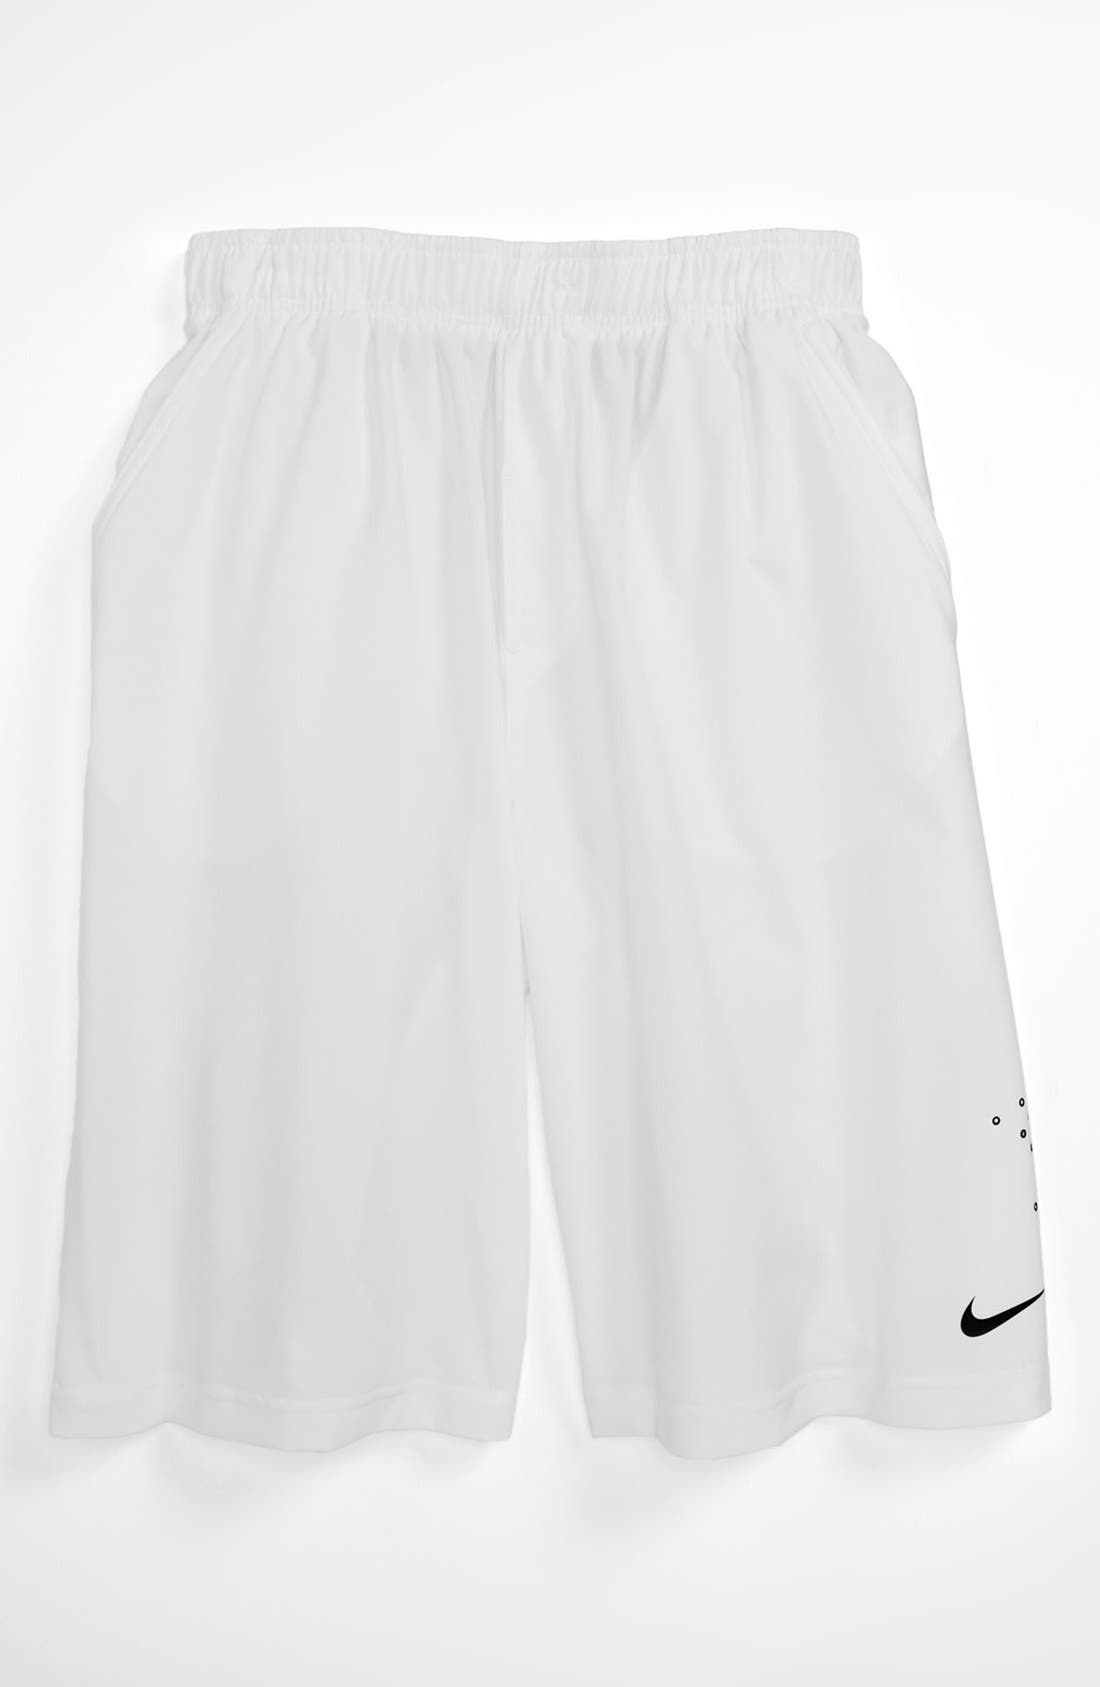 Alternate Image 1 Selected - Nike 'OZ Open Run' Shorts (Big Boys)